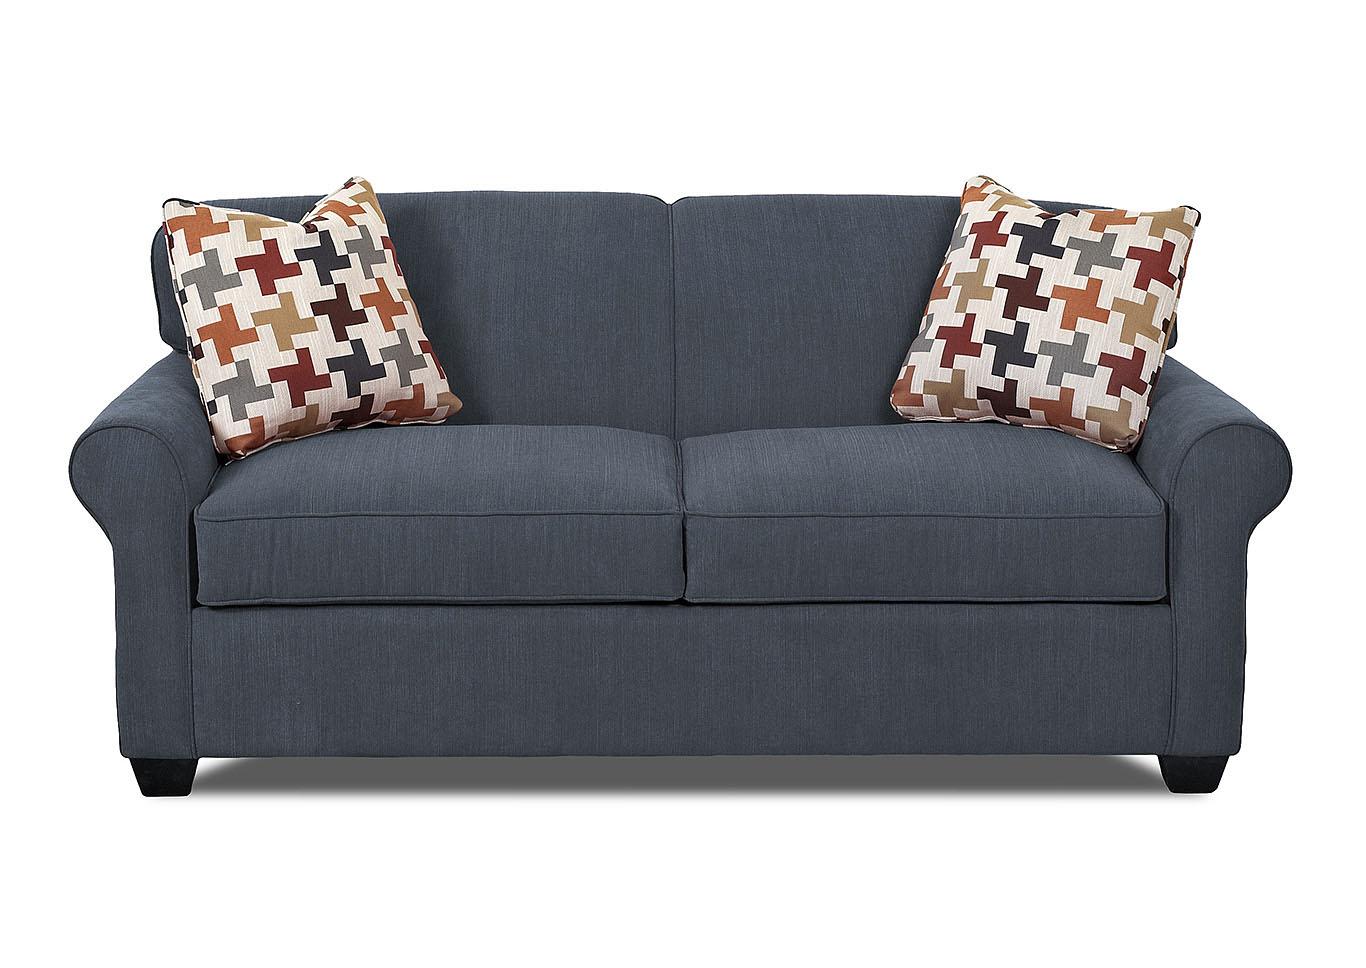 Mayhew Navy Blue Sleeper Fabric Sofa,Klaussner Home Furnishings